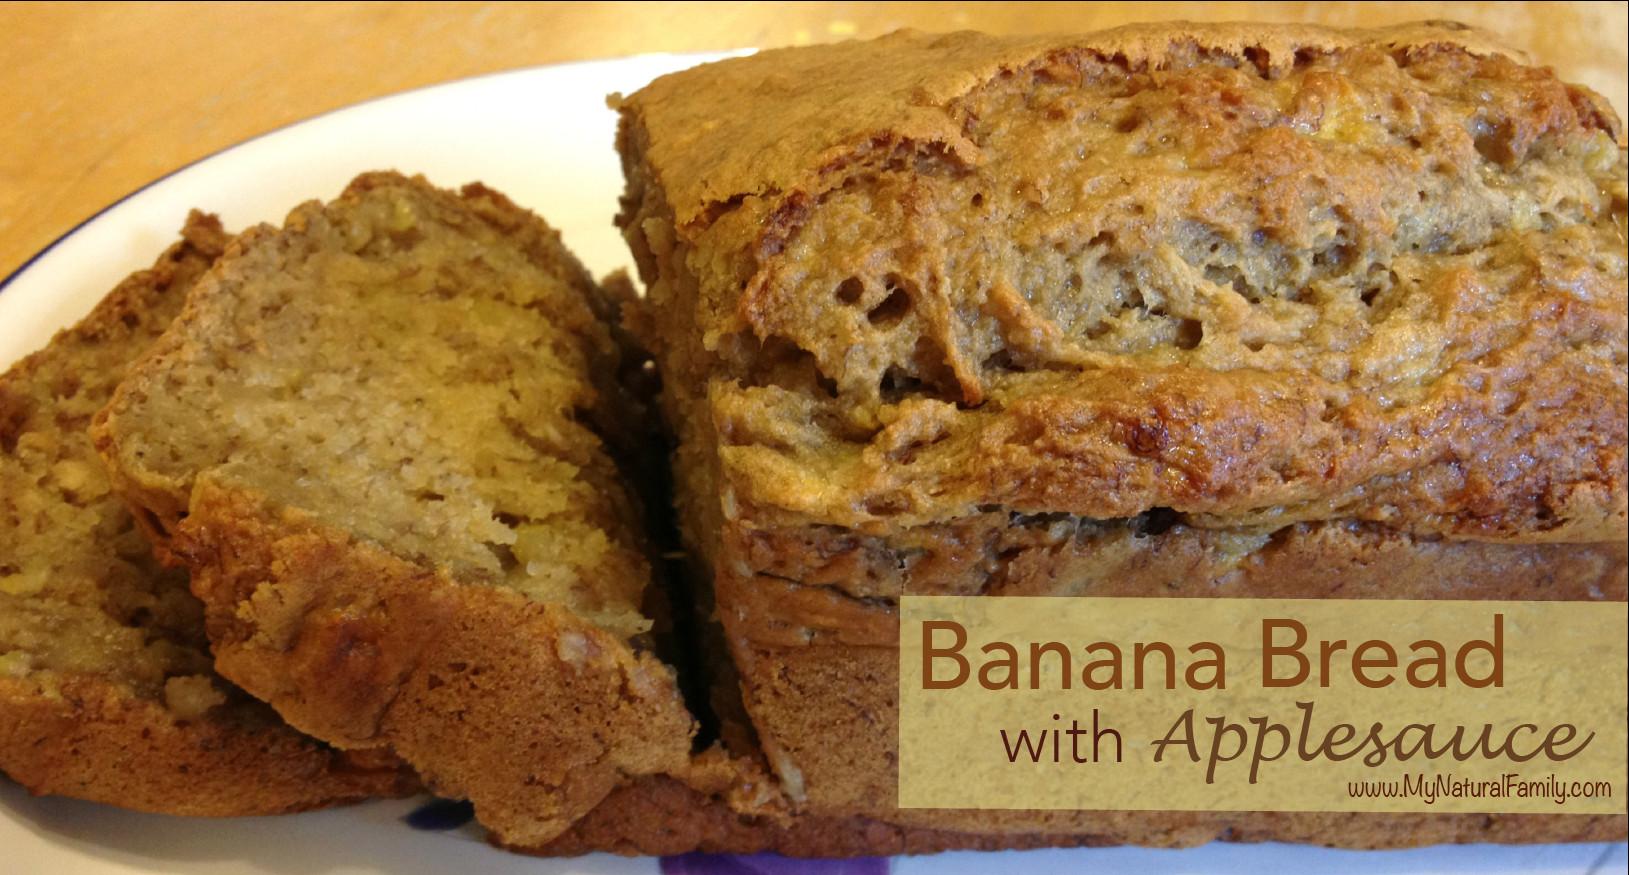 Banana Bread Recipe With Applesauce  Best 25 Banana bread with applesauce ideas on Pinterest